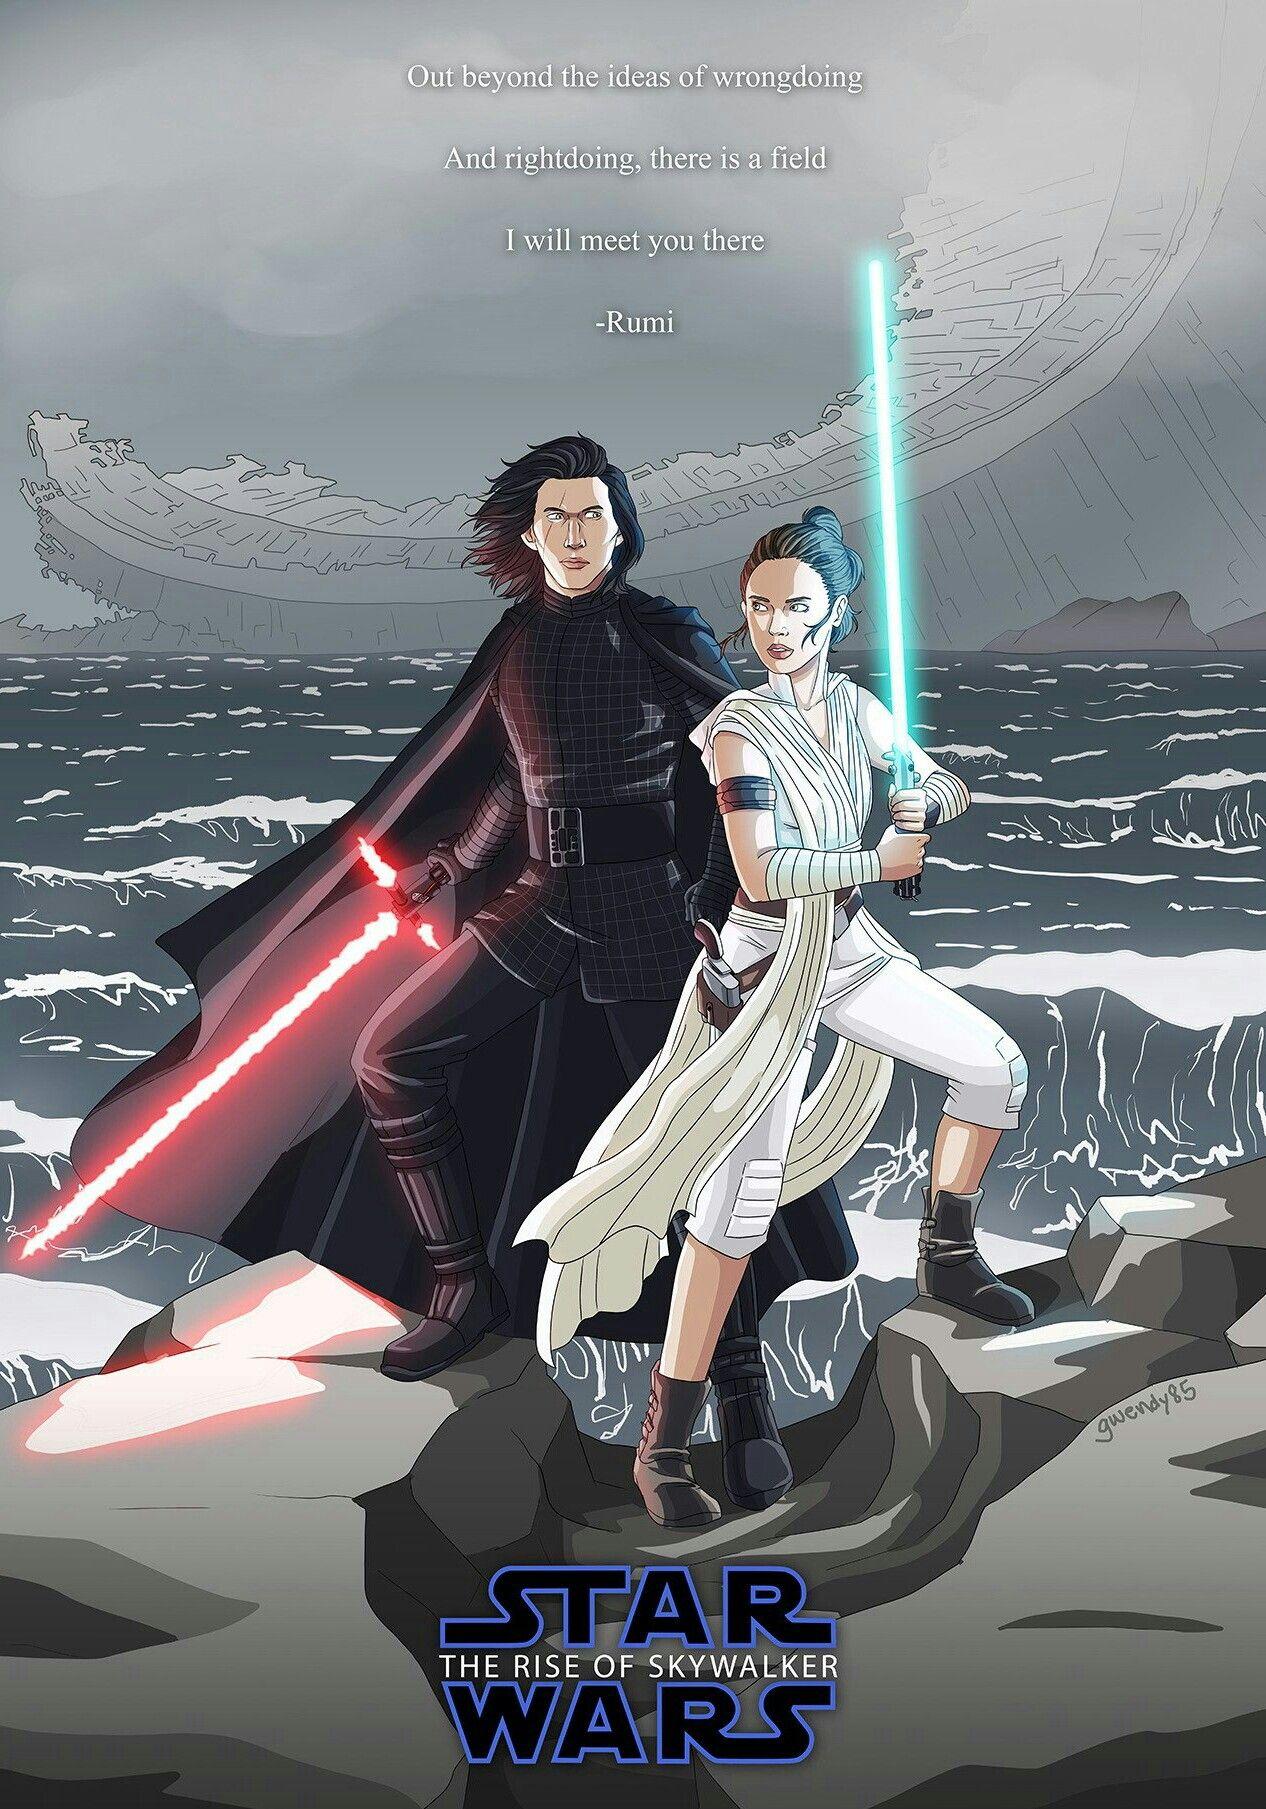 Kylo Ren And Rey Star Wars Humor Star Wars Fandom Star Wars Art